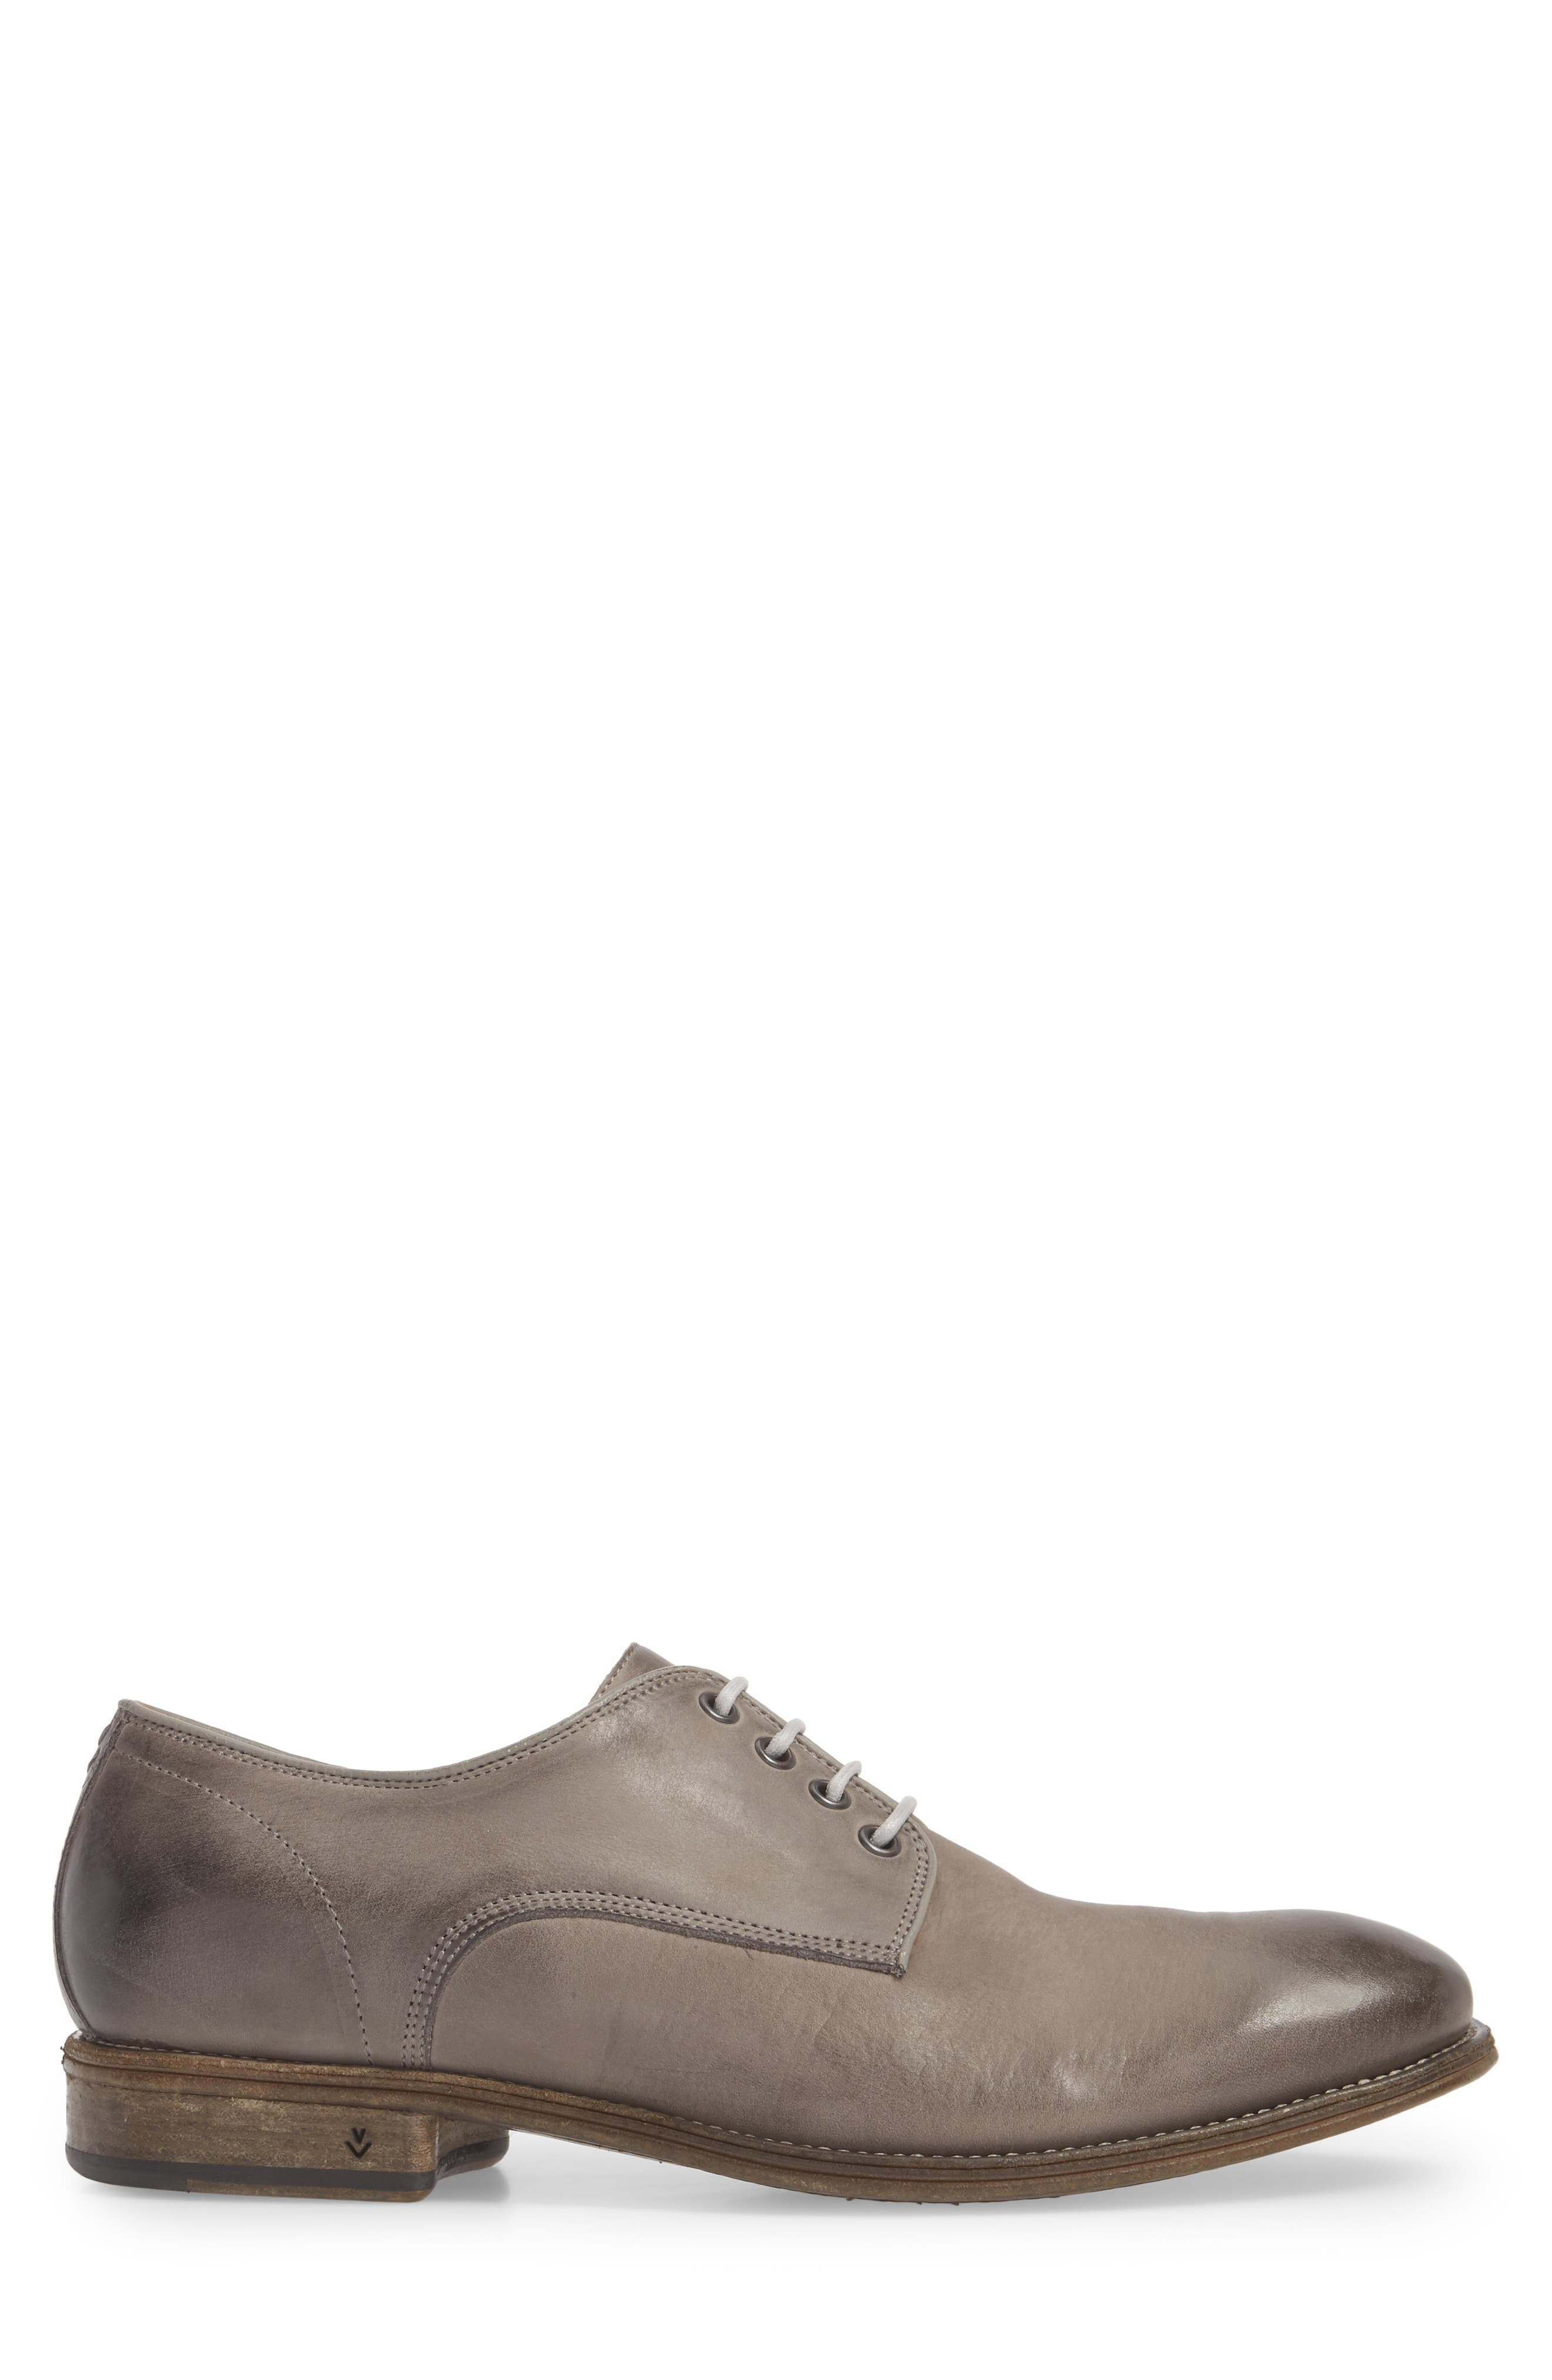 John Varvatos Stanton Plain Toe Derby,                             Alternate thumbnail 3, color,                             Ash Leather